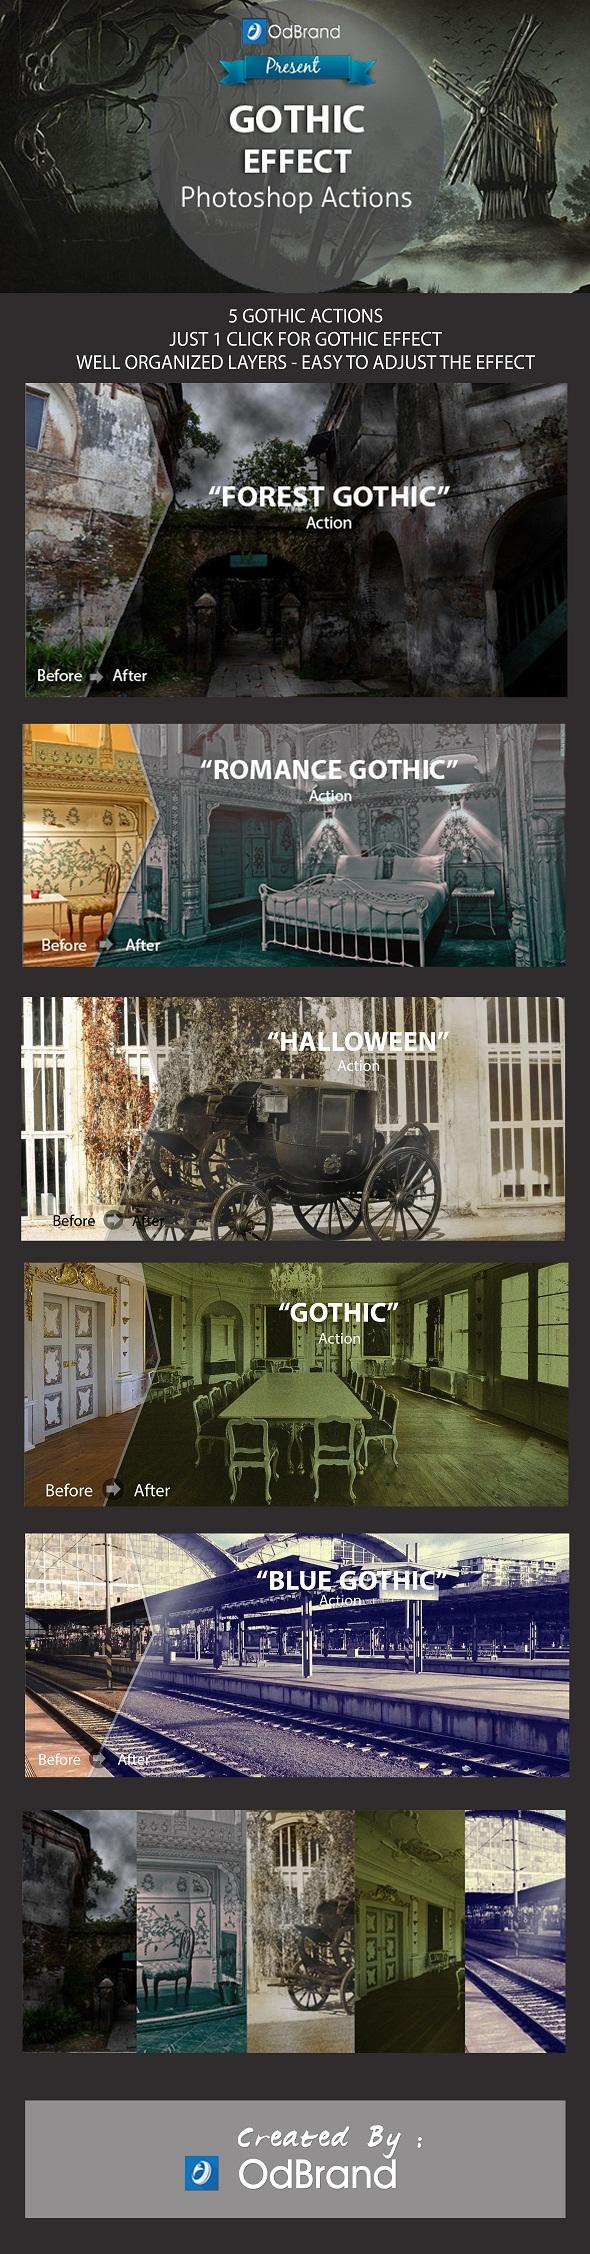 Gothic Effect Photoshop Action - Actions Photoshop